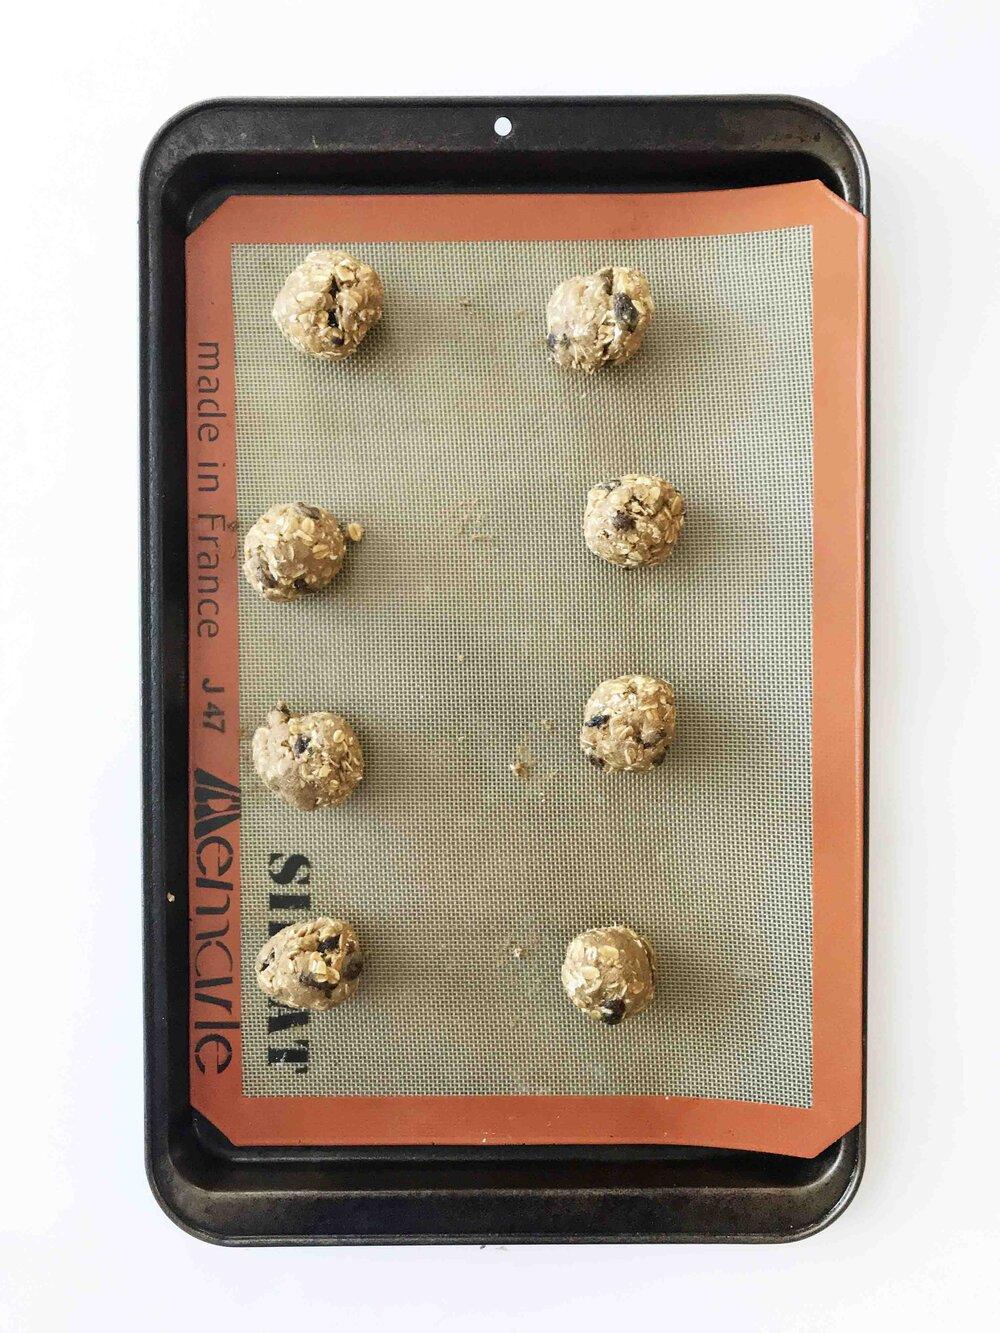 oatmeal-raisin-cookies8.jpg